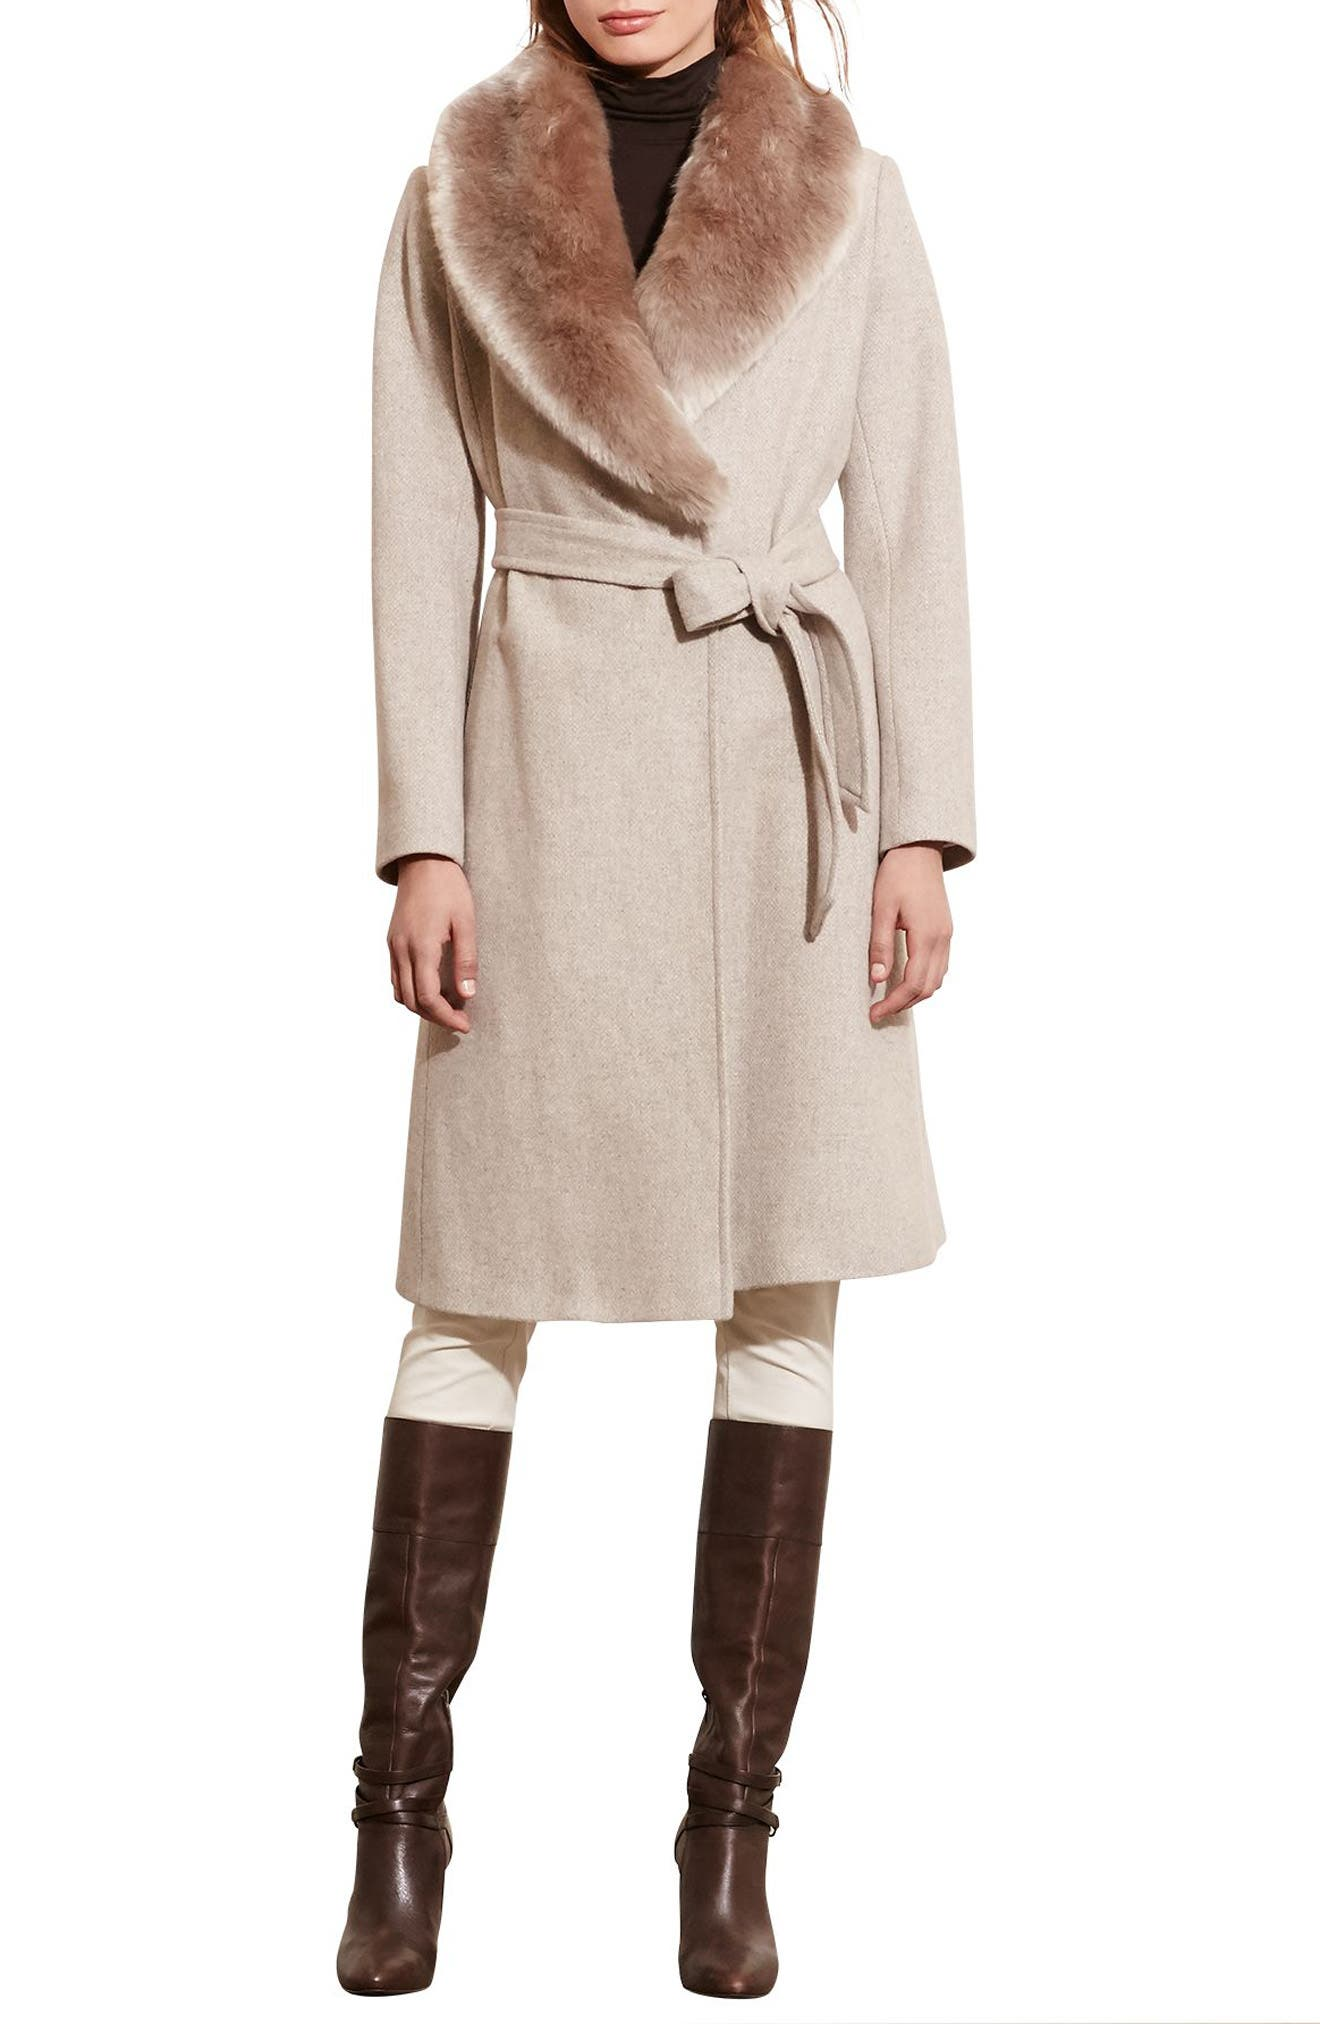 LAUREN RALPH LAUREN Wool Blend Coat with Faux Fur Collar, Main, color, PLATINUM HEATHER